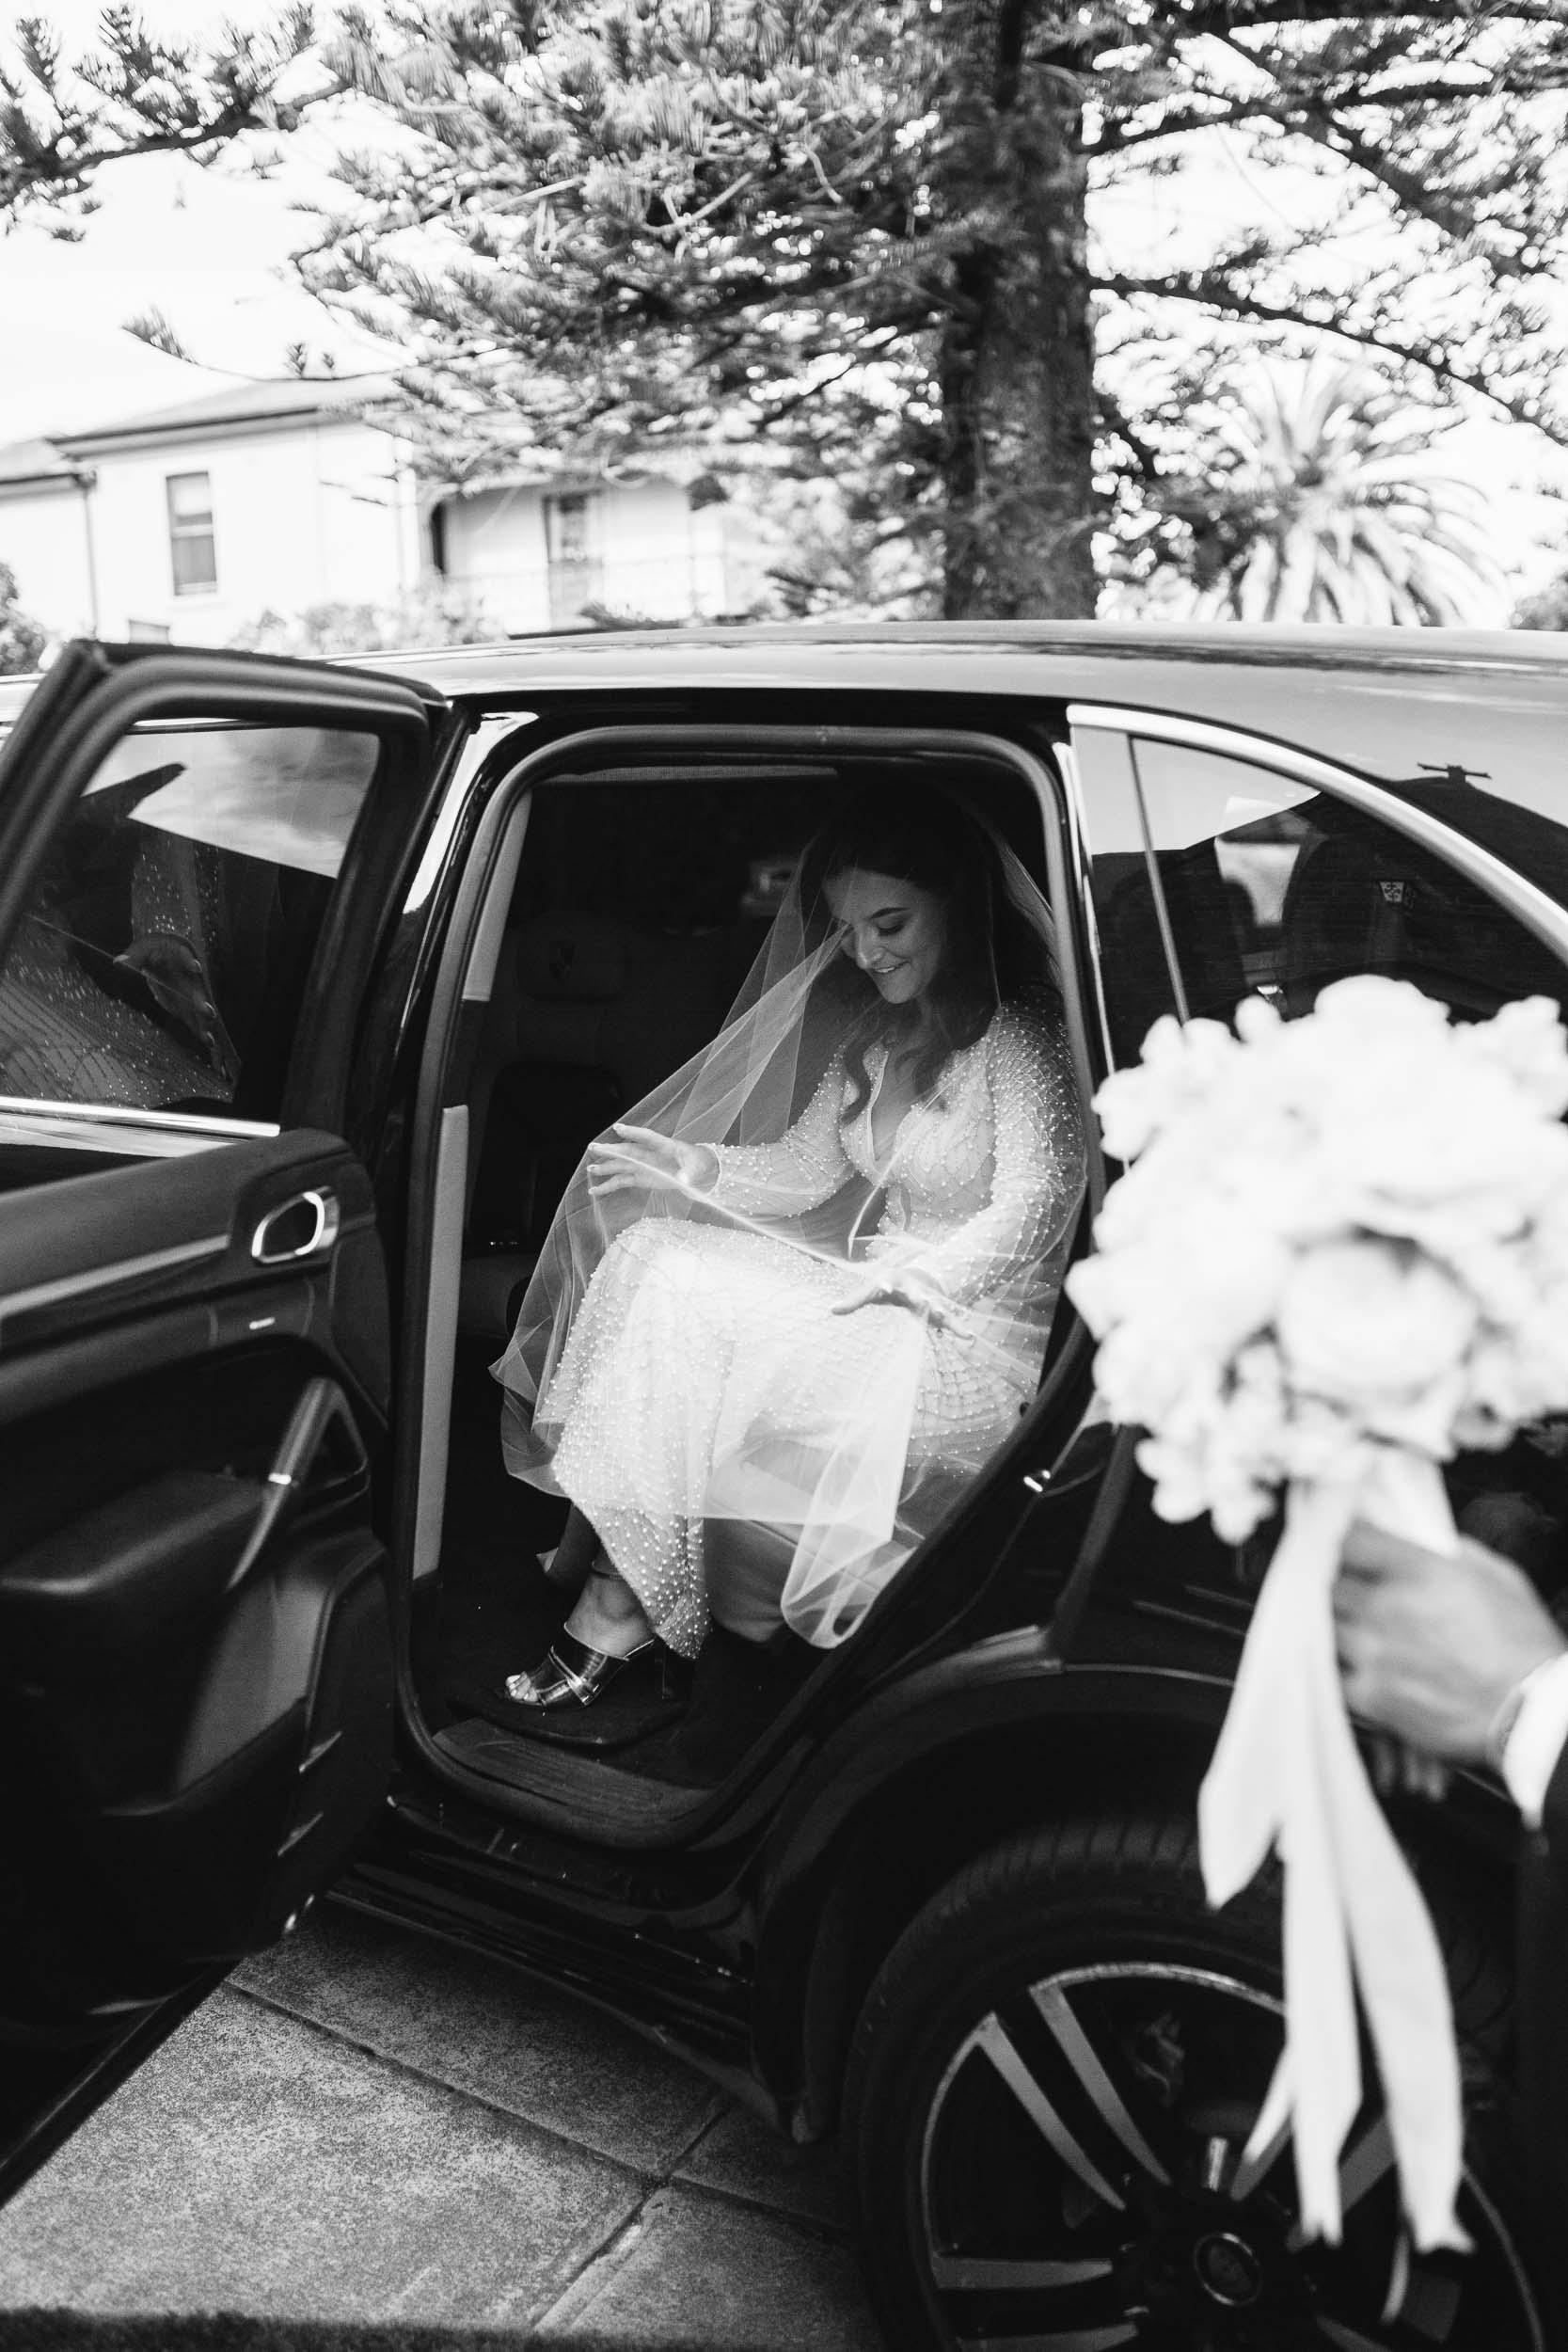 Kas-Richards-Wedding-Photographer-Melbourne-City-Wedding-Alto-Event-Space-Jane-Hill-Bridal-Gown-21.jpg